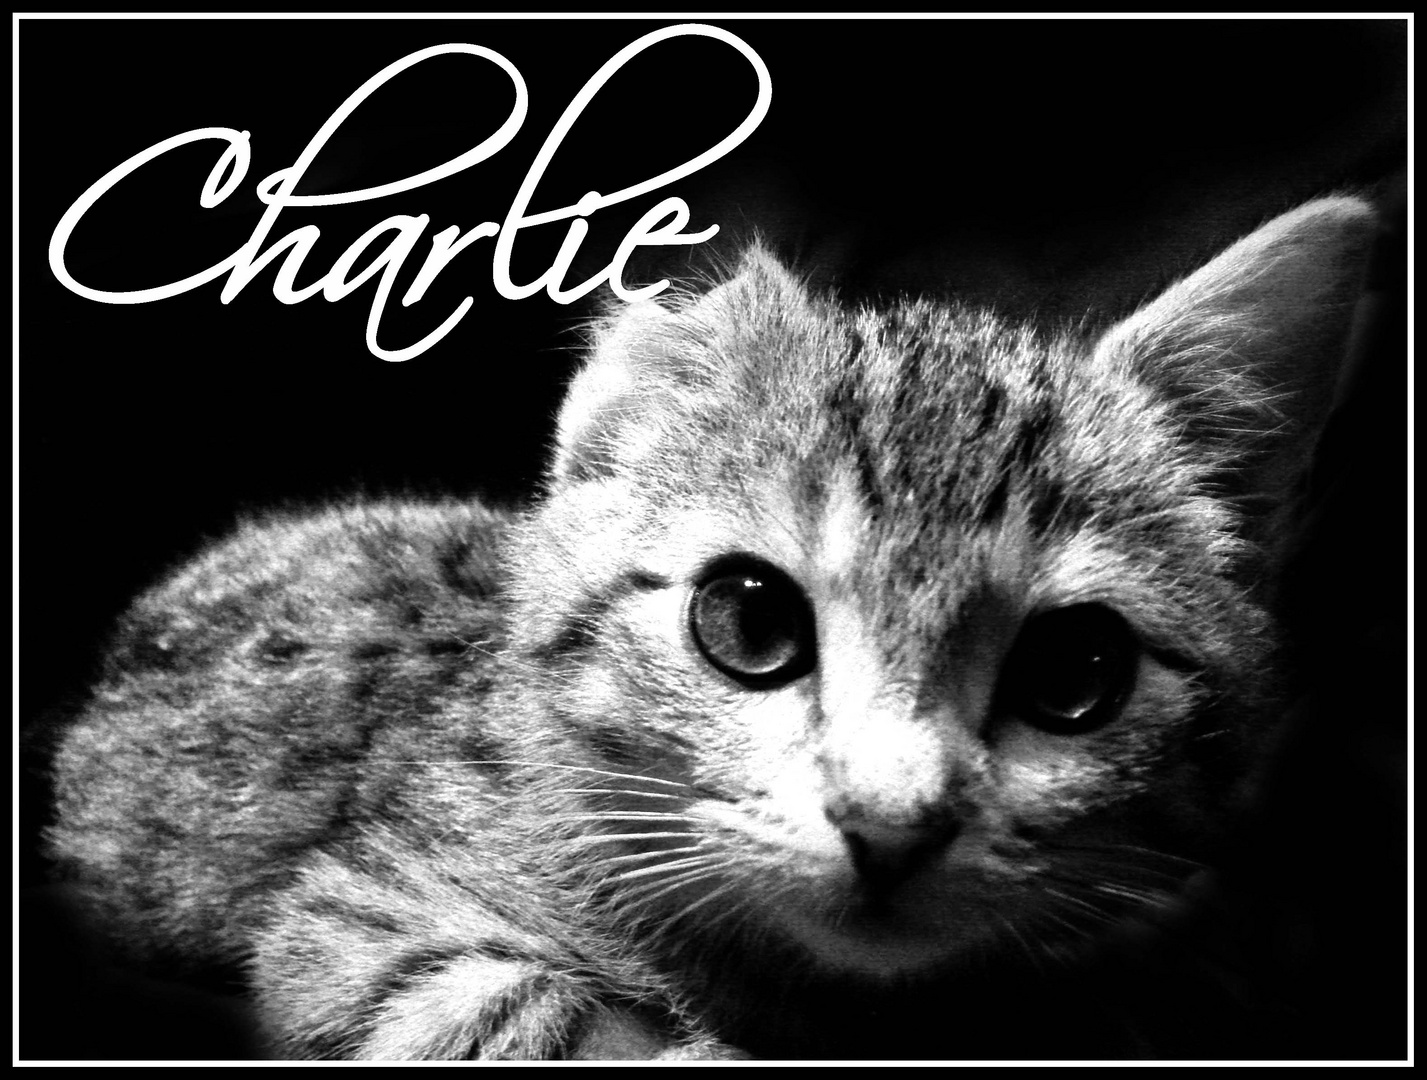 - Charlie -